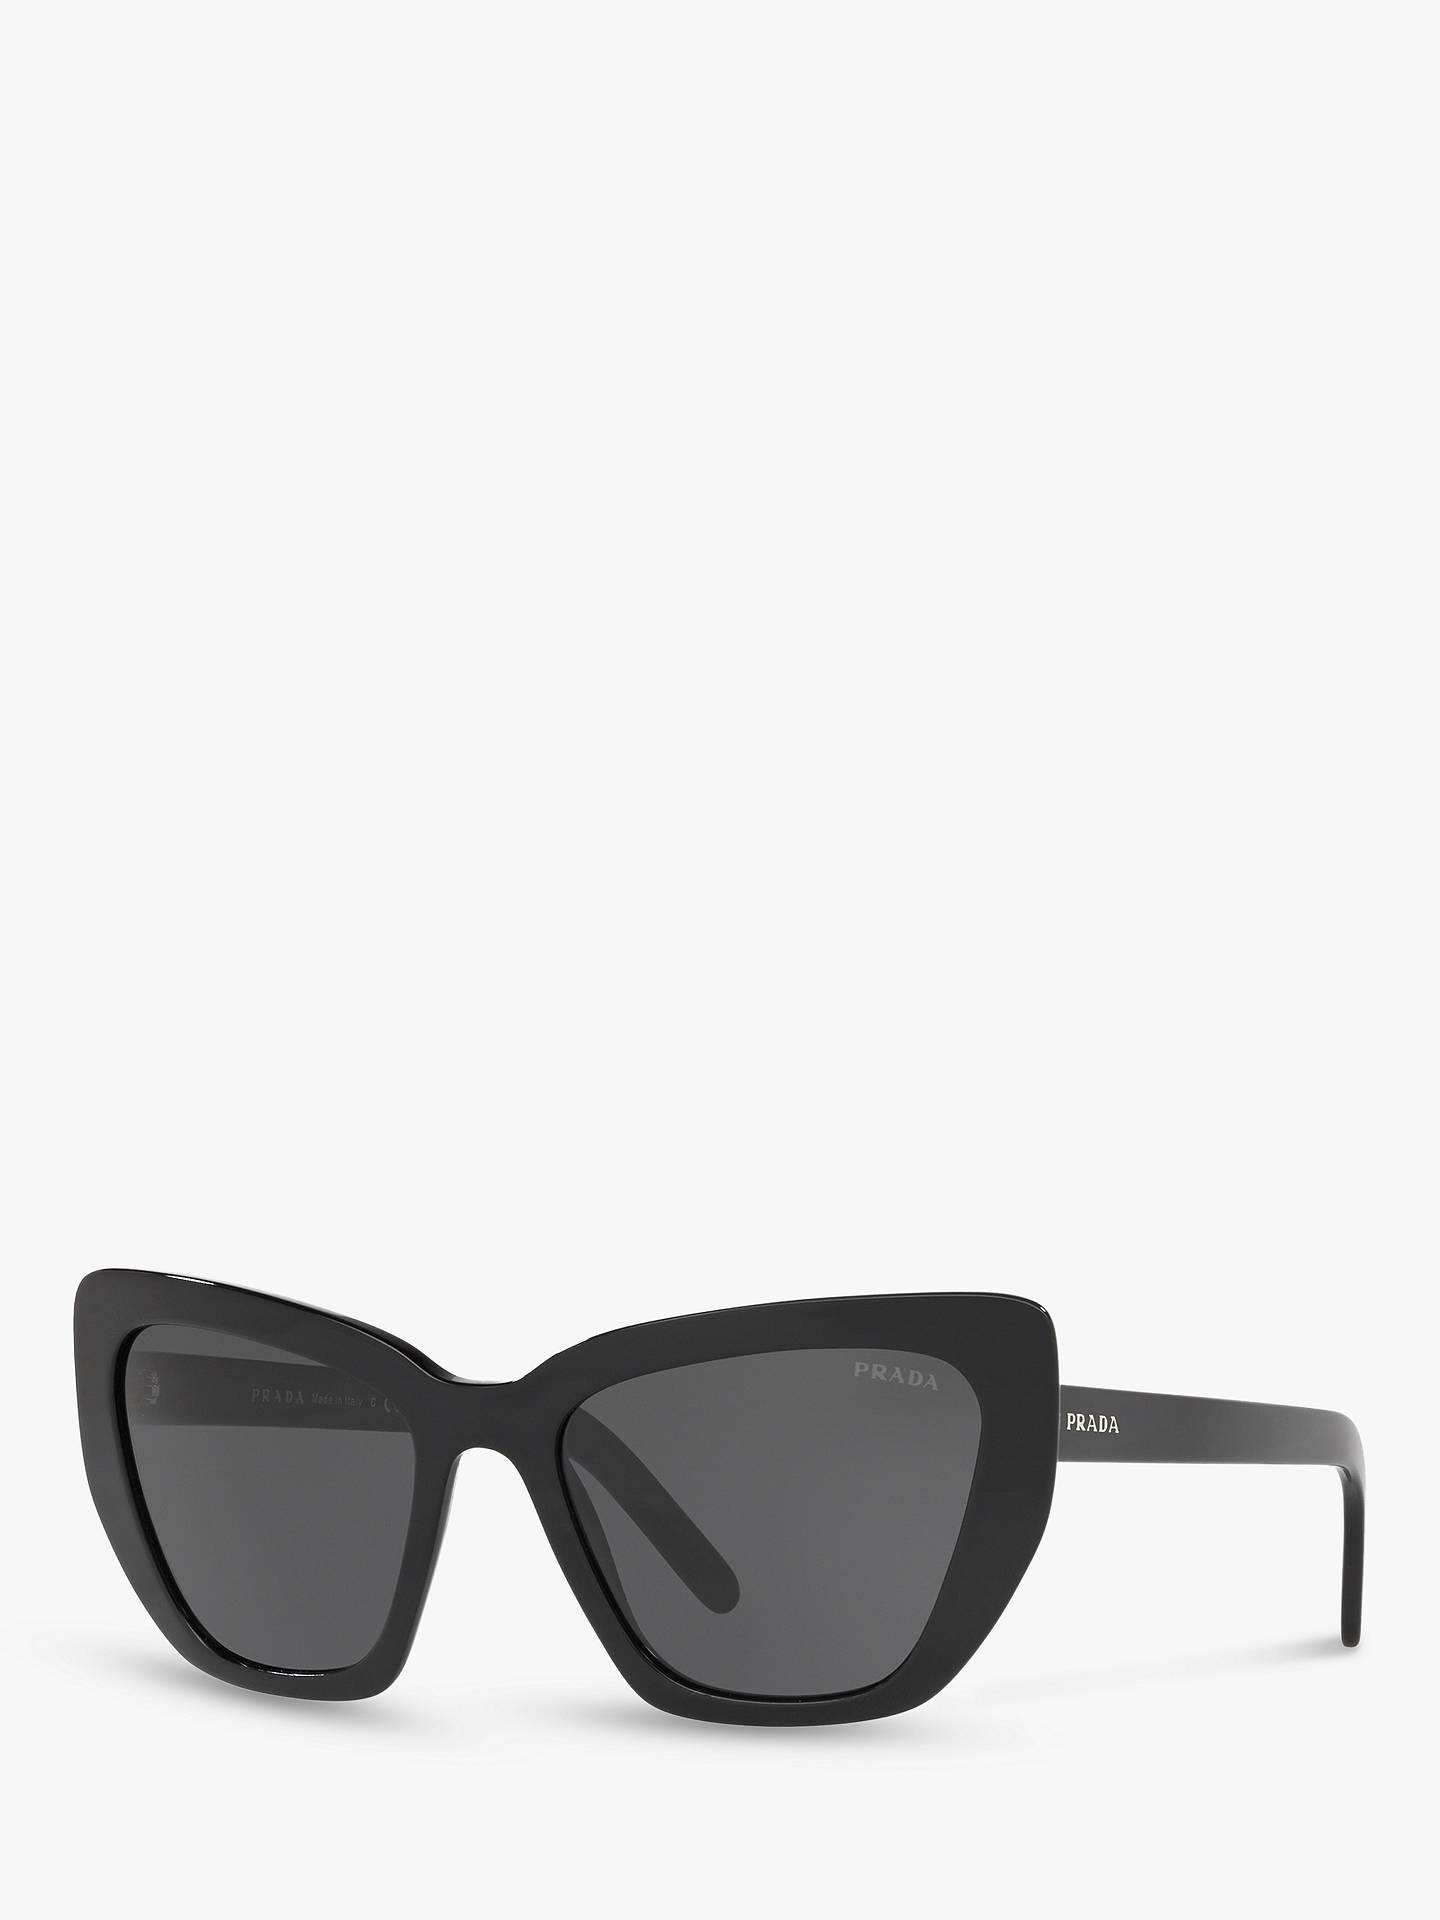 4bf84356937 Prada PR 08VS Women s Cat s Eye Sunglasses at John Lewis   Partners